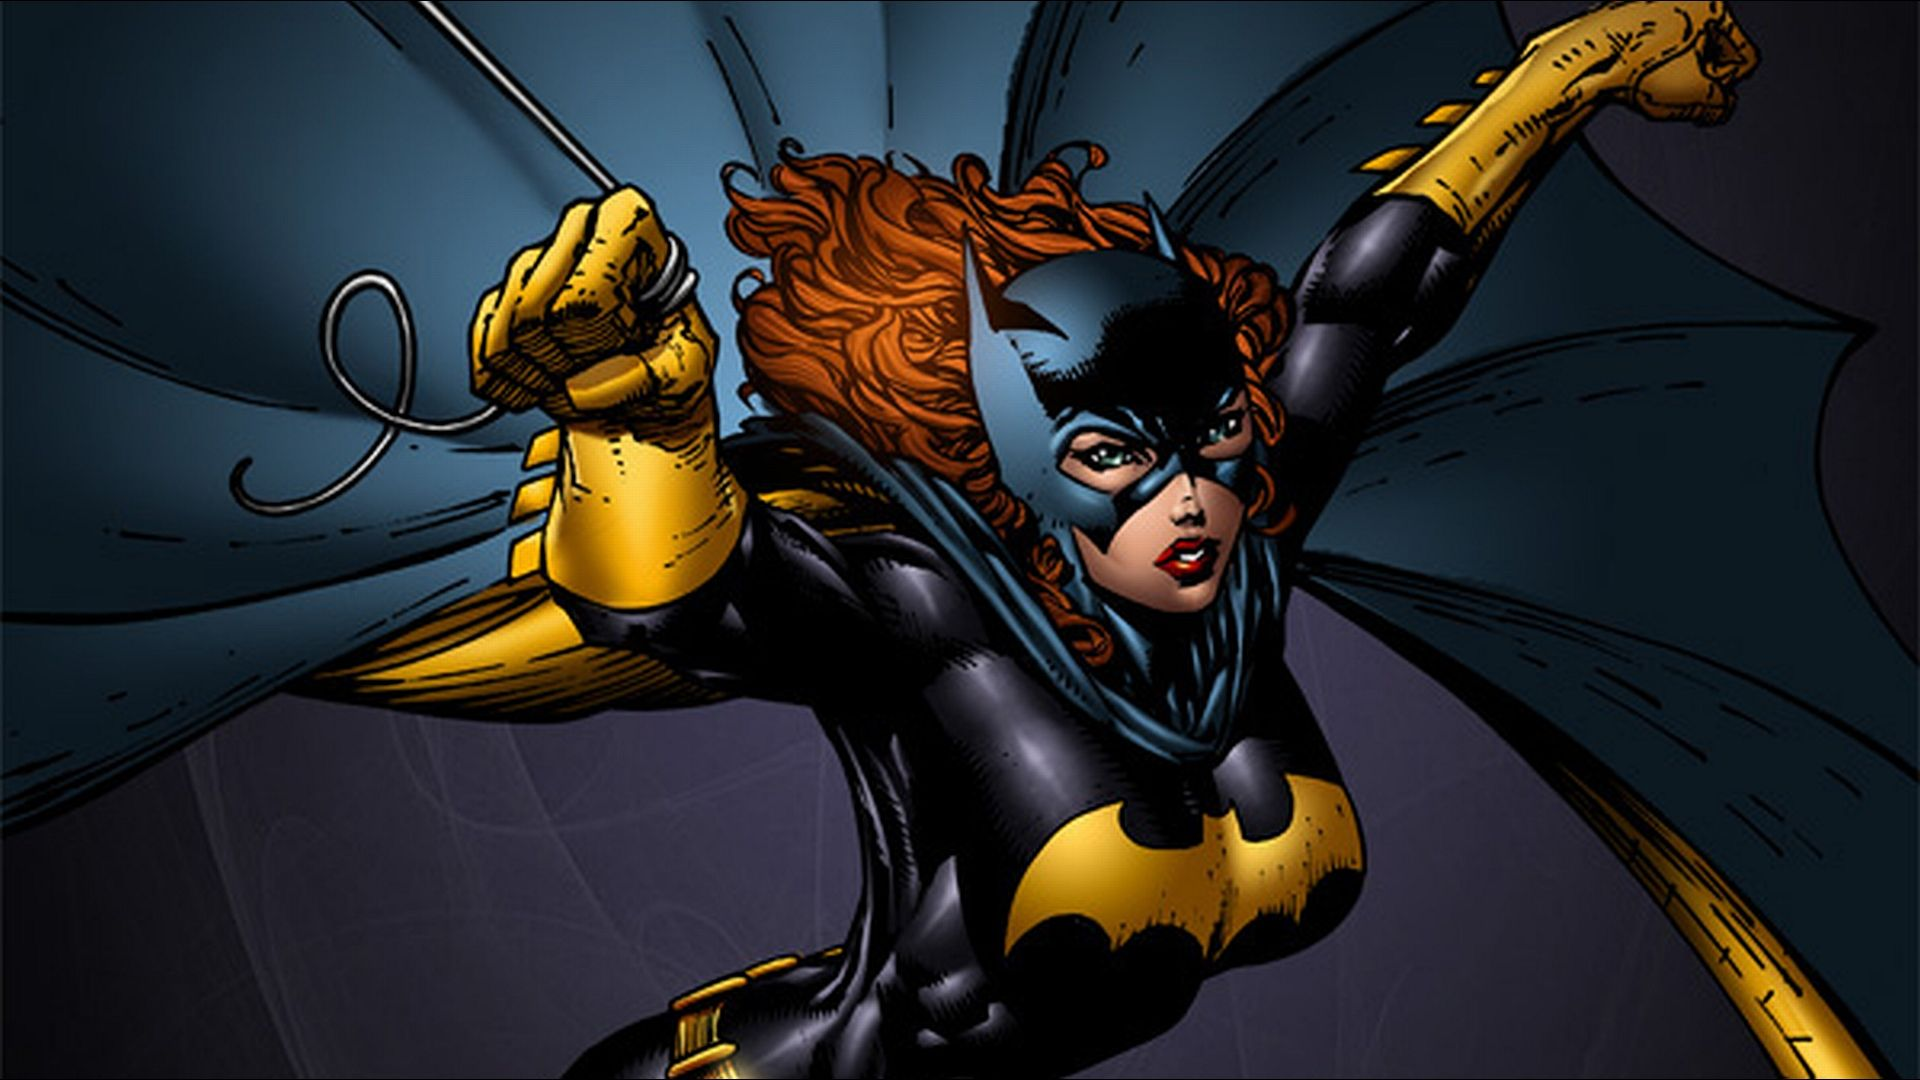 Batgirl Batgirl Batgirl Headed To Injustice Gods Among Us